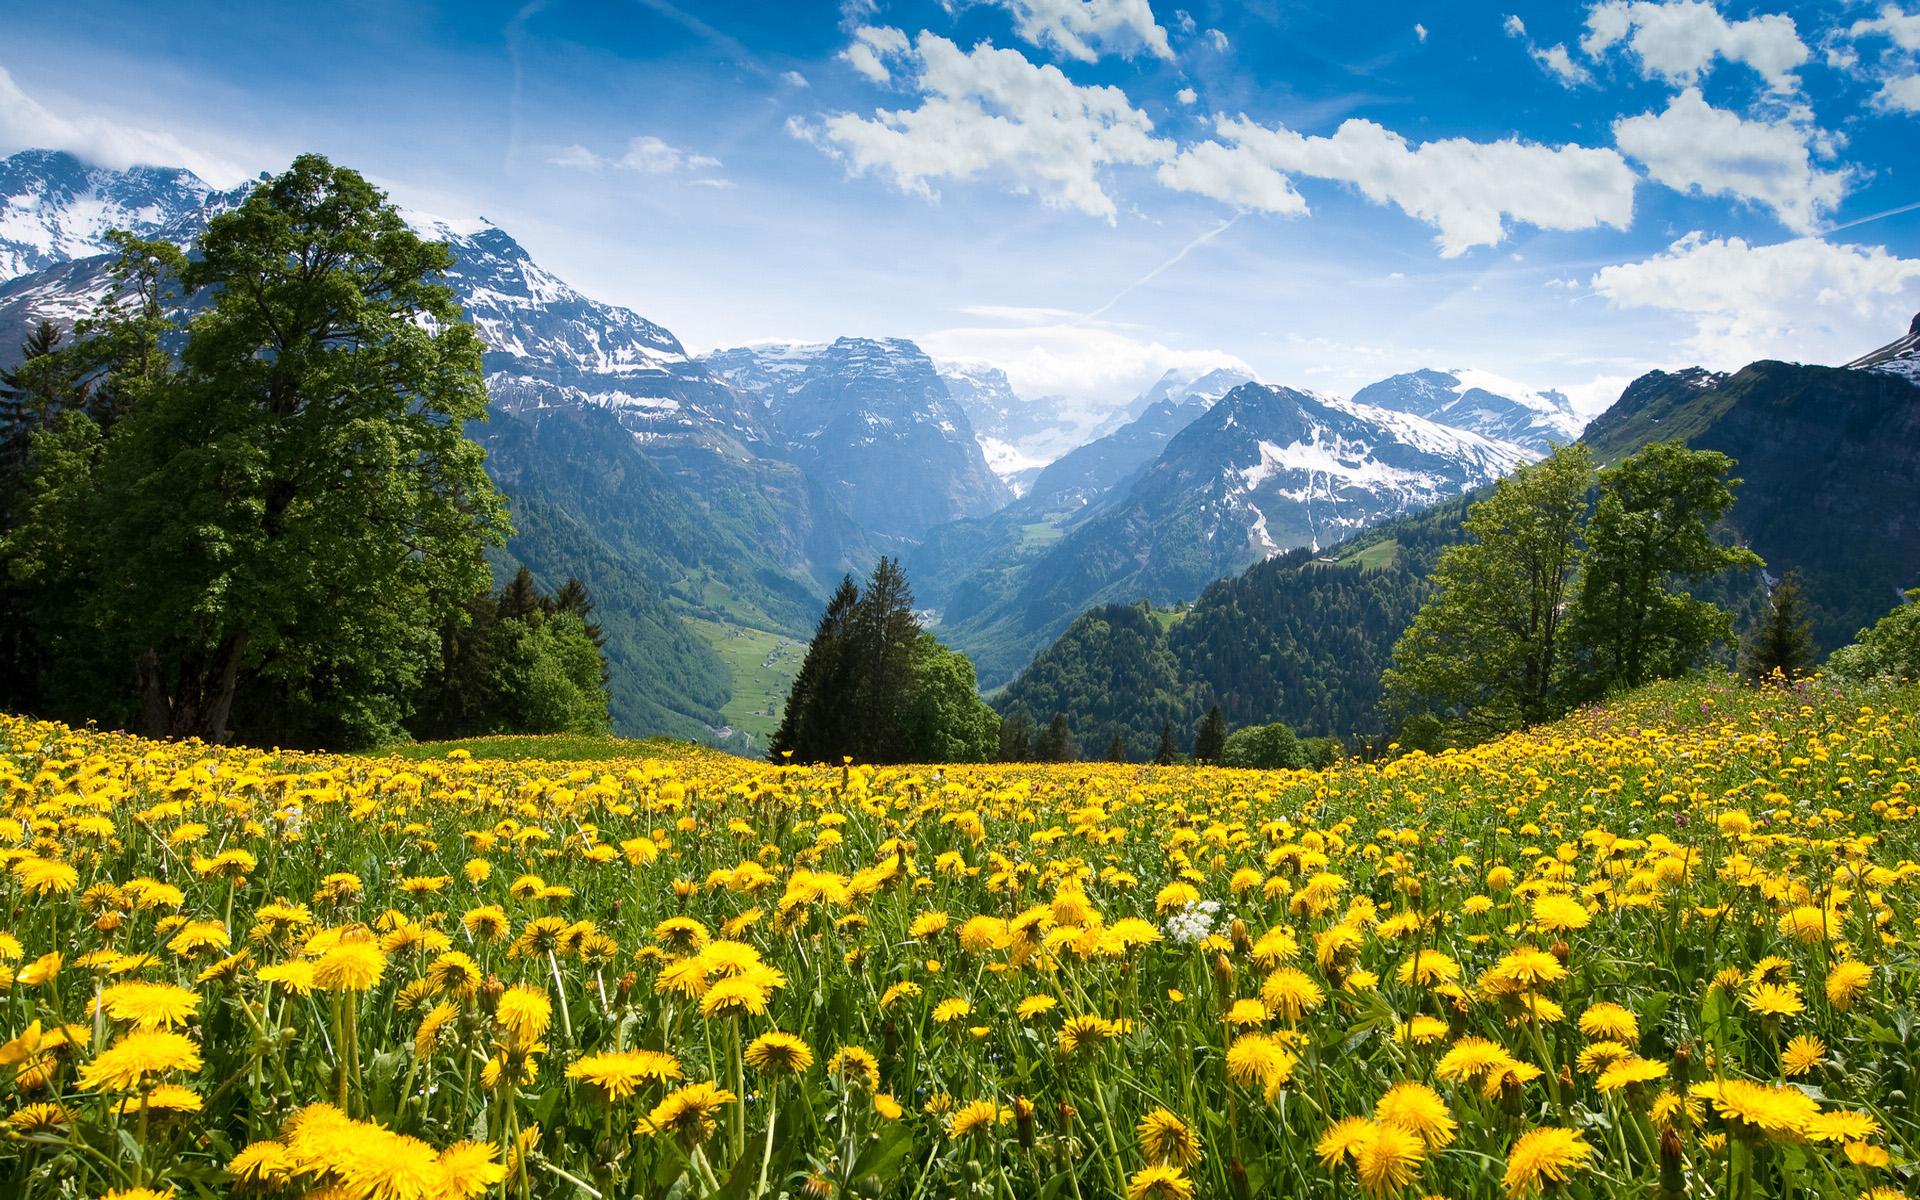 amazing summer scenery wallpaper 34575